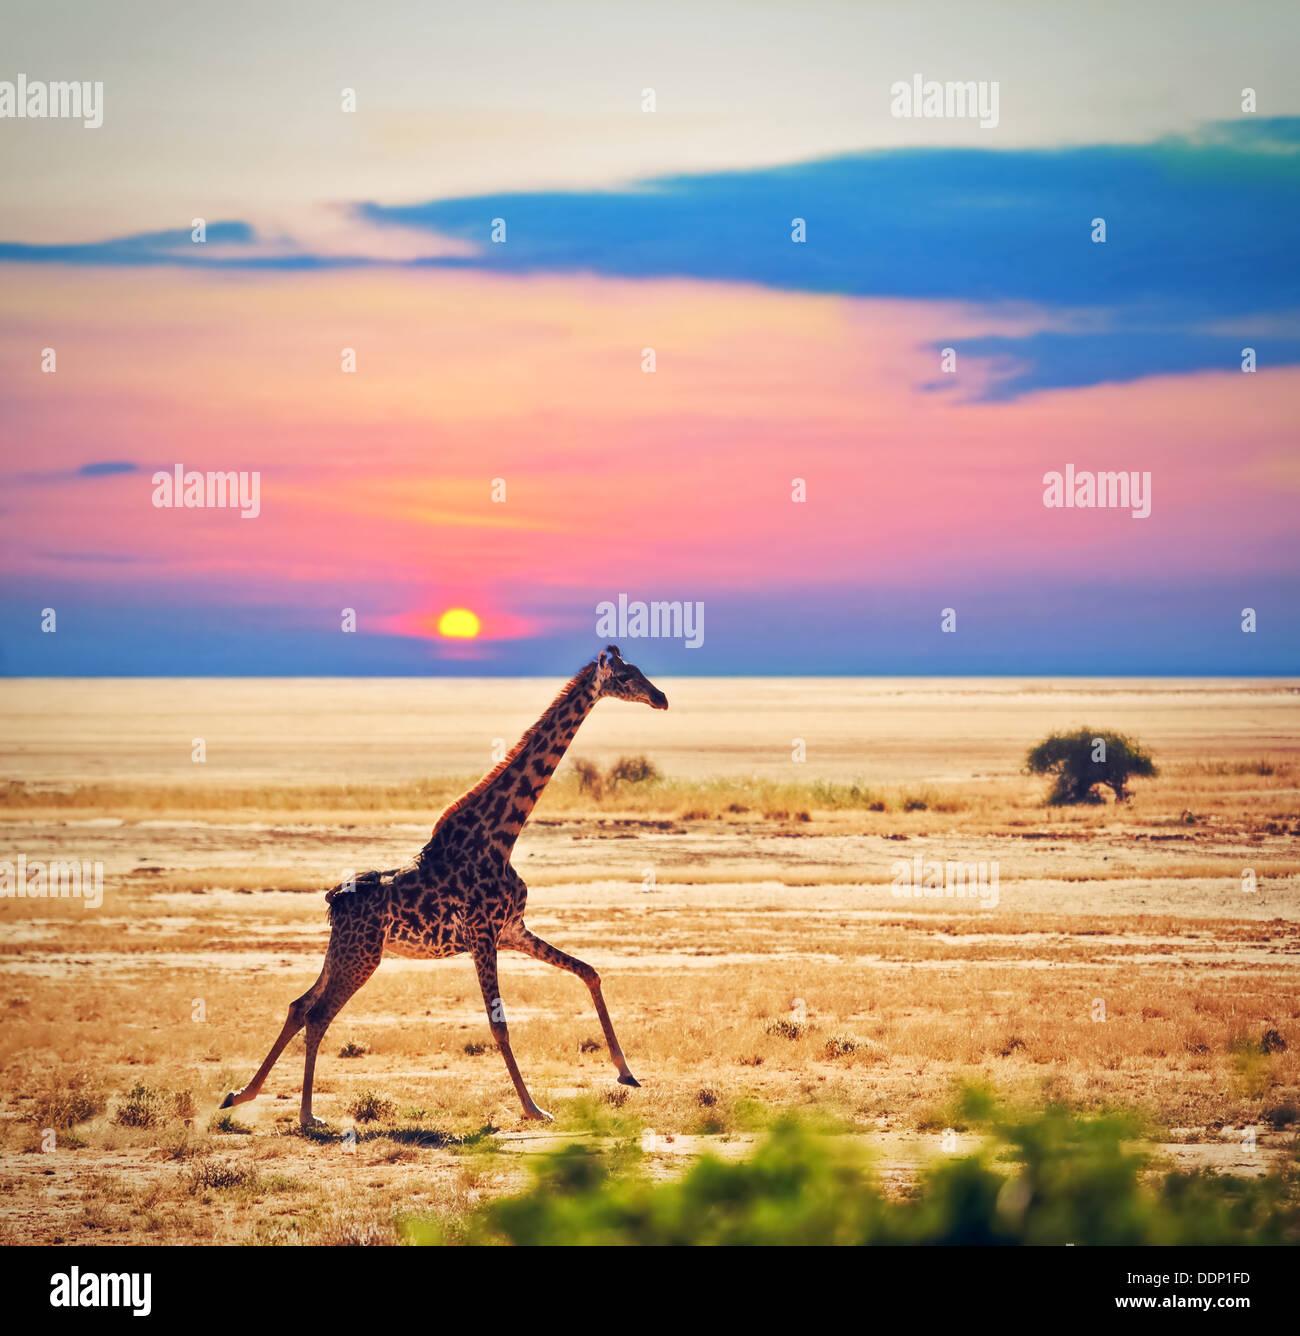 La fauna selvatica - Giraffe in esecuzione sulla savana al tramonto. Safari in Amboseli National Park, Kenya, Africa Immagini Stock